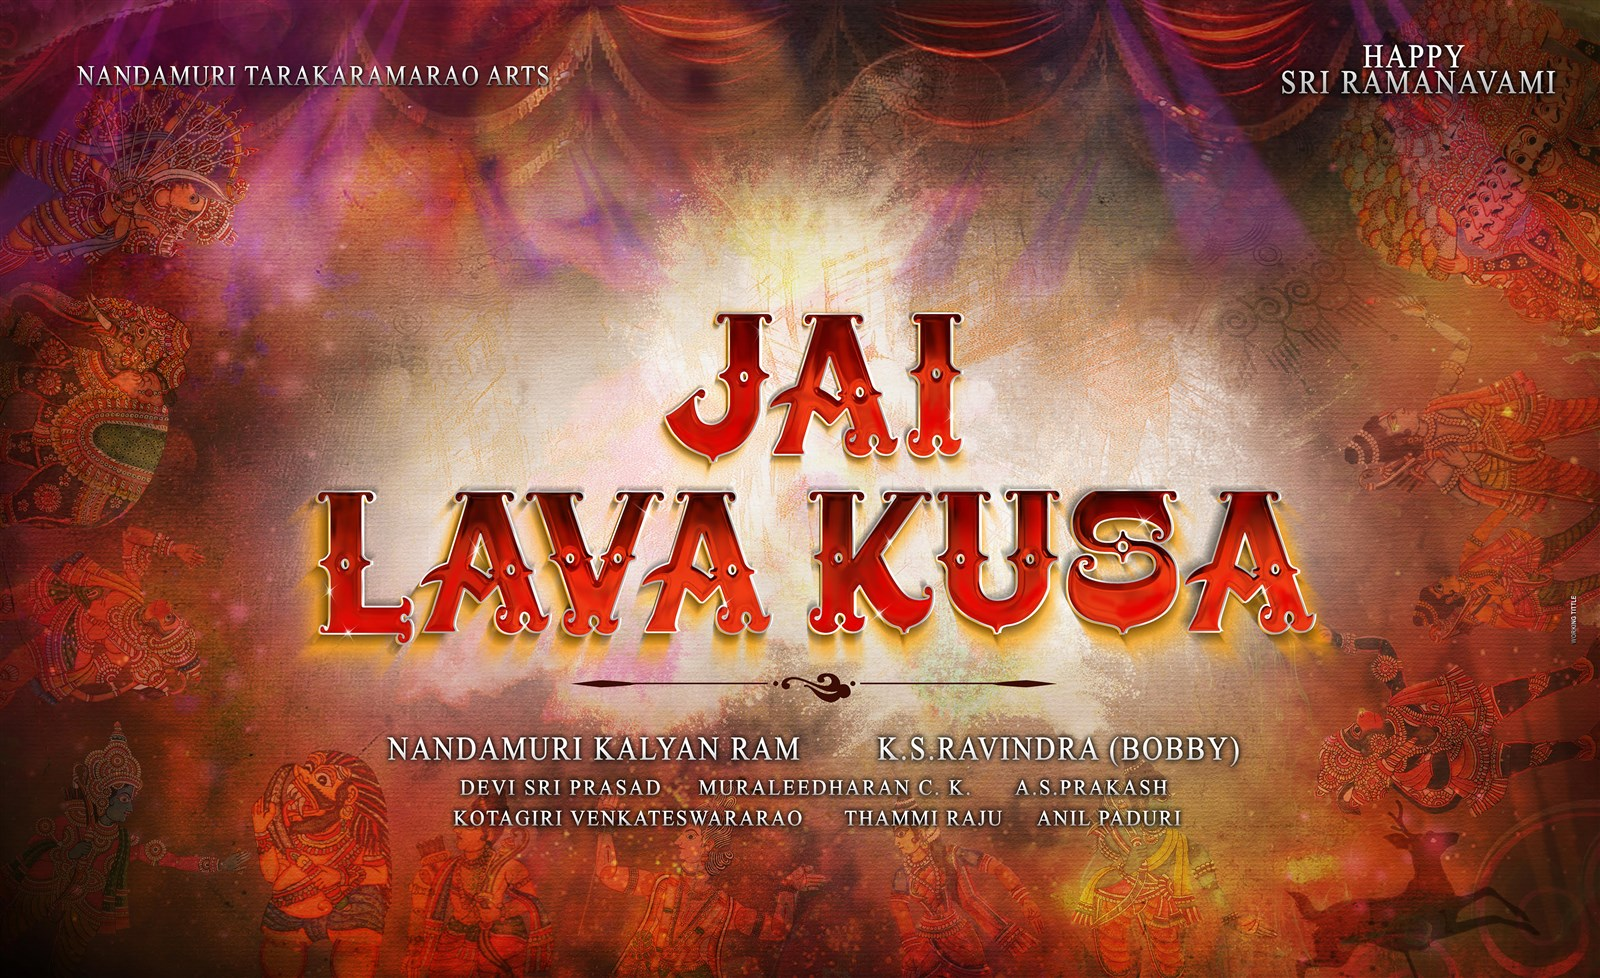 Jr Ntr Hd Wallpapers Jr Ntr S Jai Lava Kusa Movie Sriramanavami Wishes